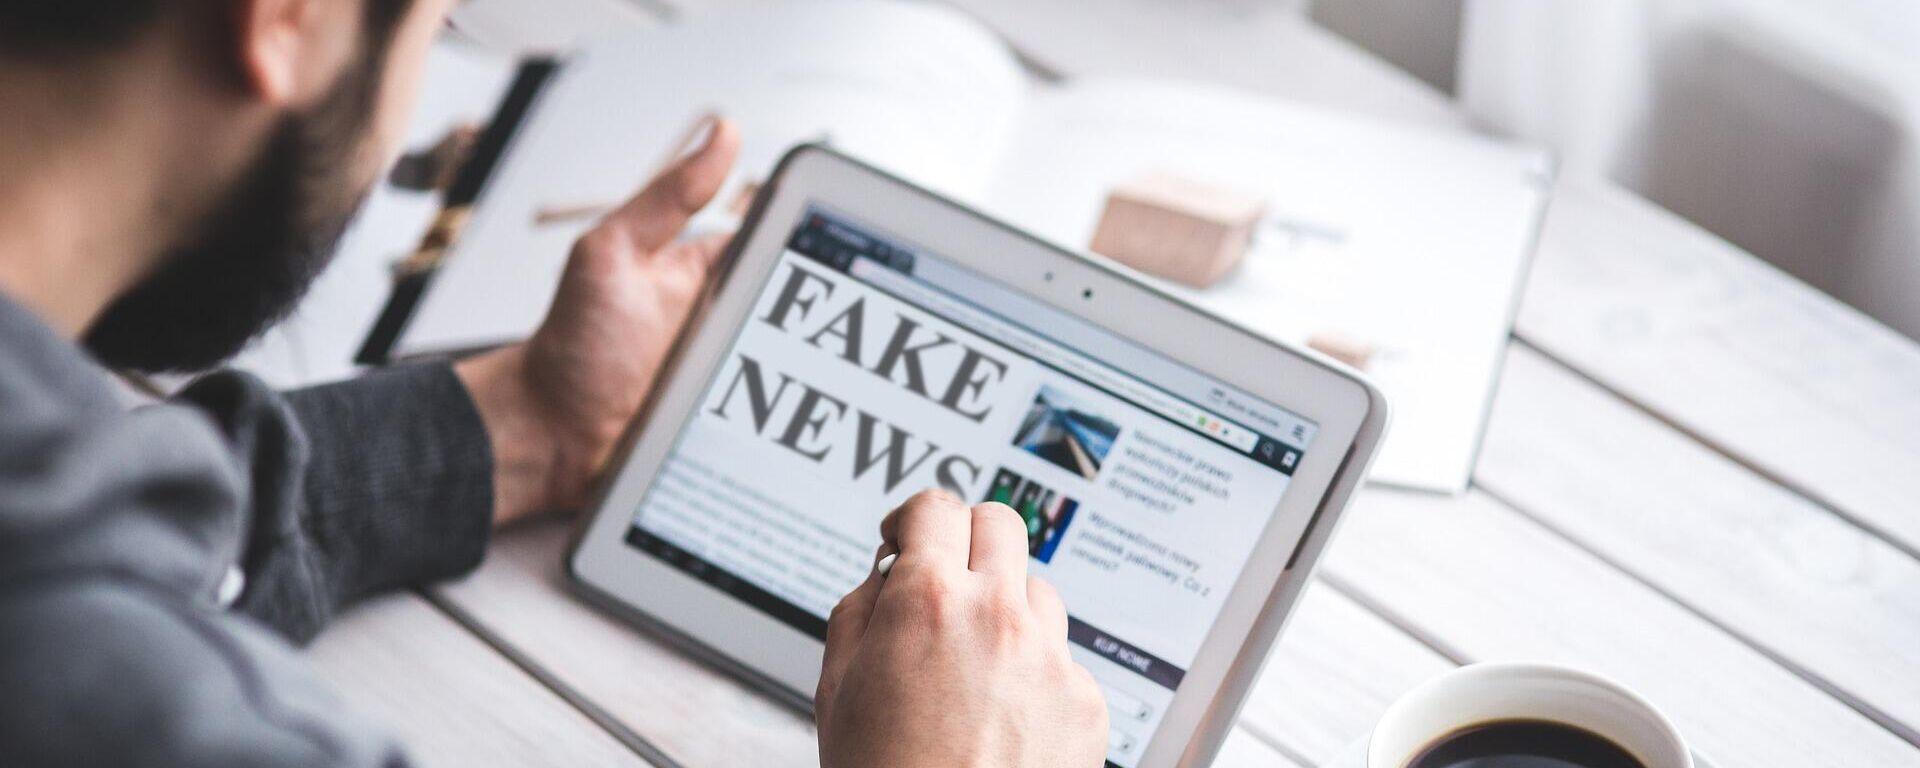 Fake News (Symbolbild) - SNA, 1920, 02.07.2021